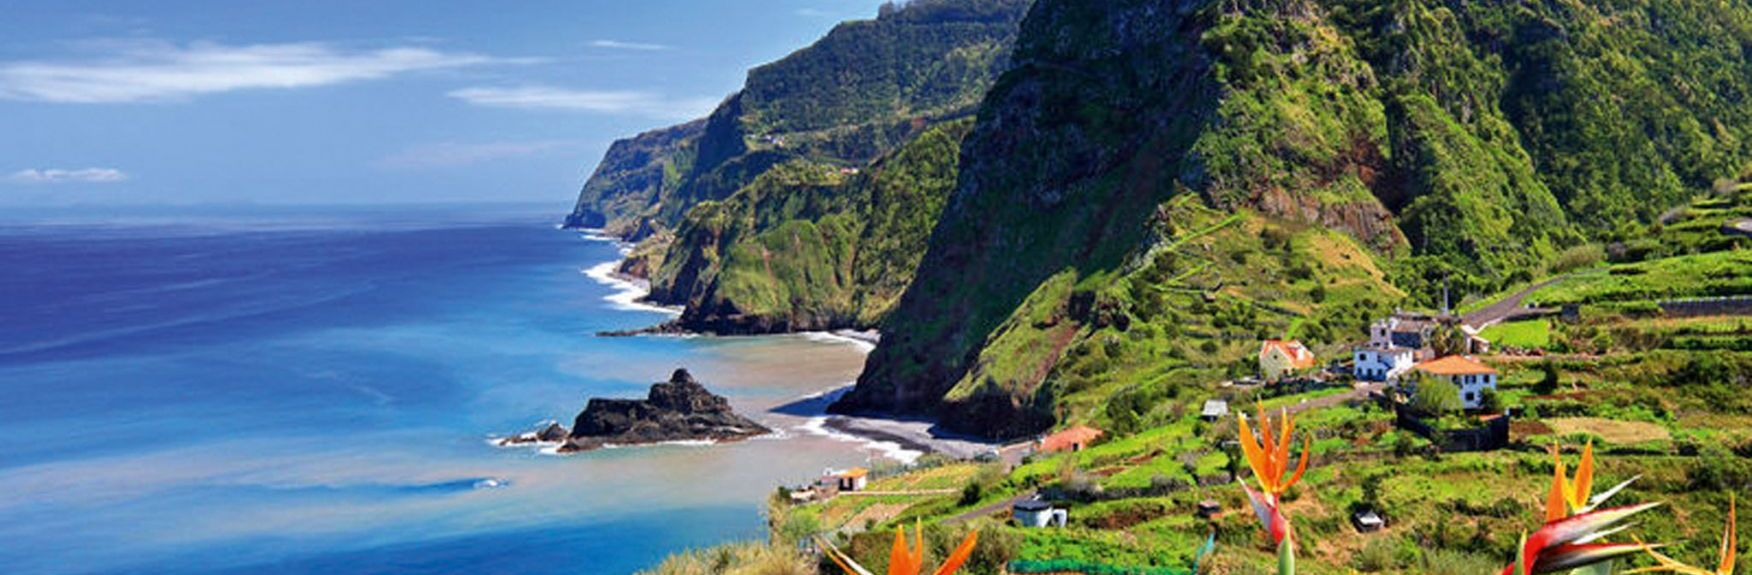 Santa Luzia, Funchal, Madeira, Portugal